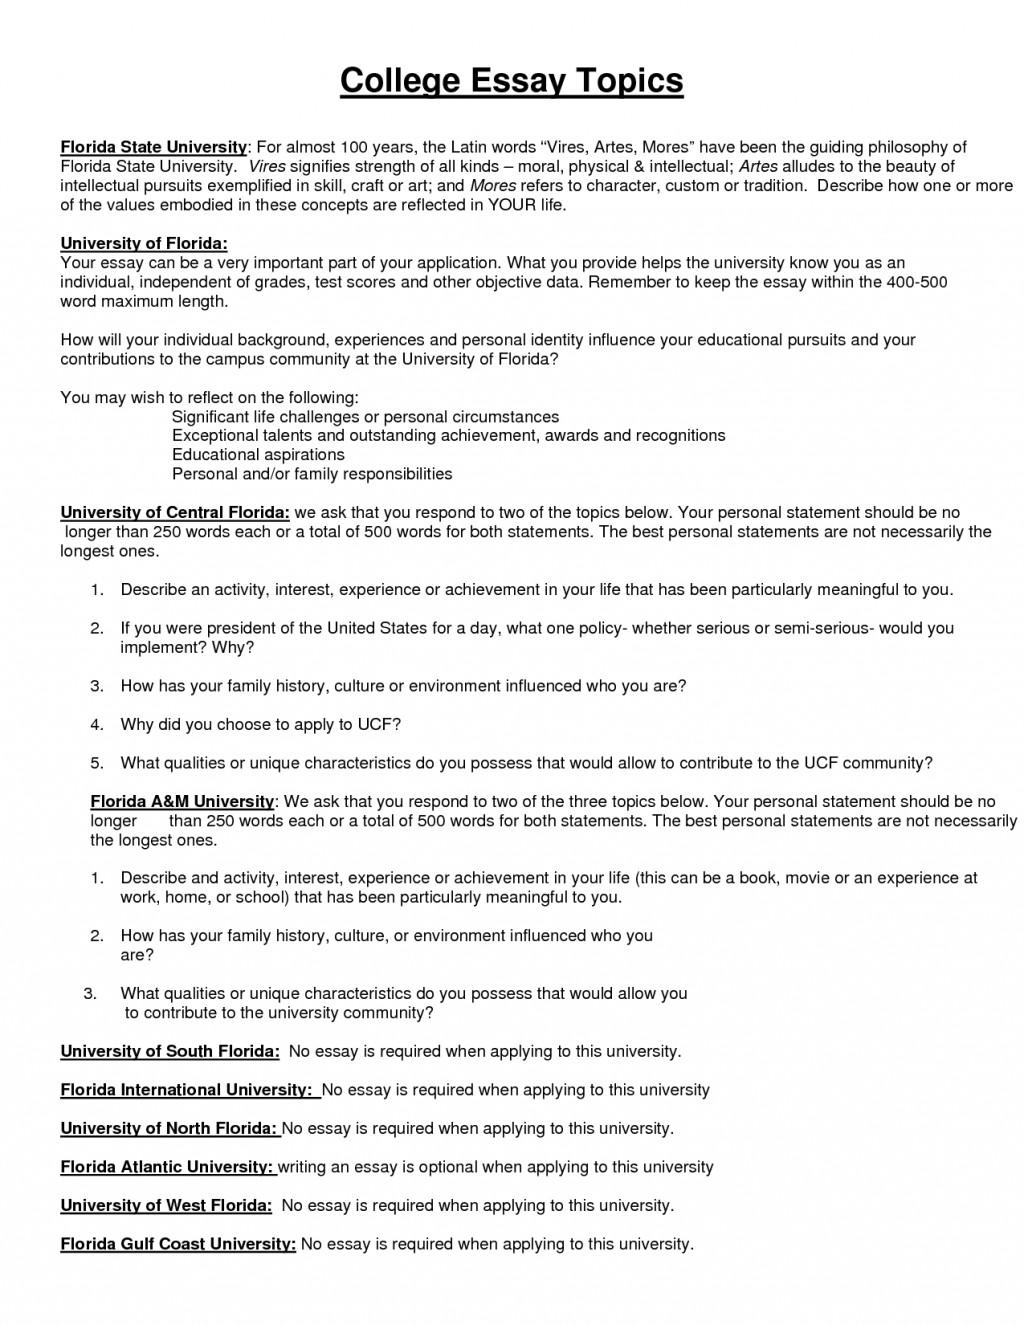 003 Essay Example 4khqbt5dlt Creative College Marvelous Topics List Interesting 2018 Large